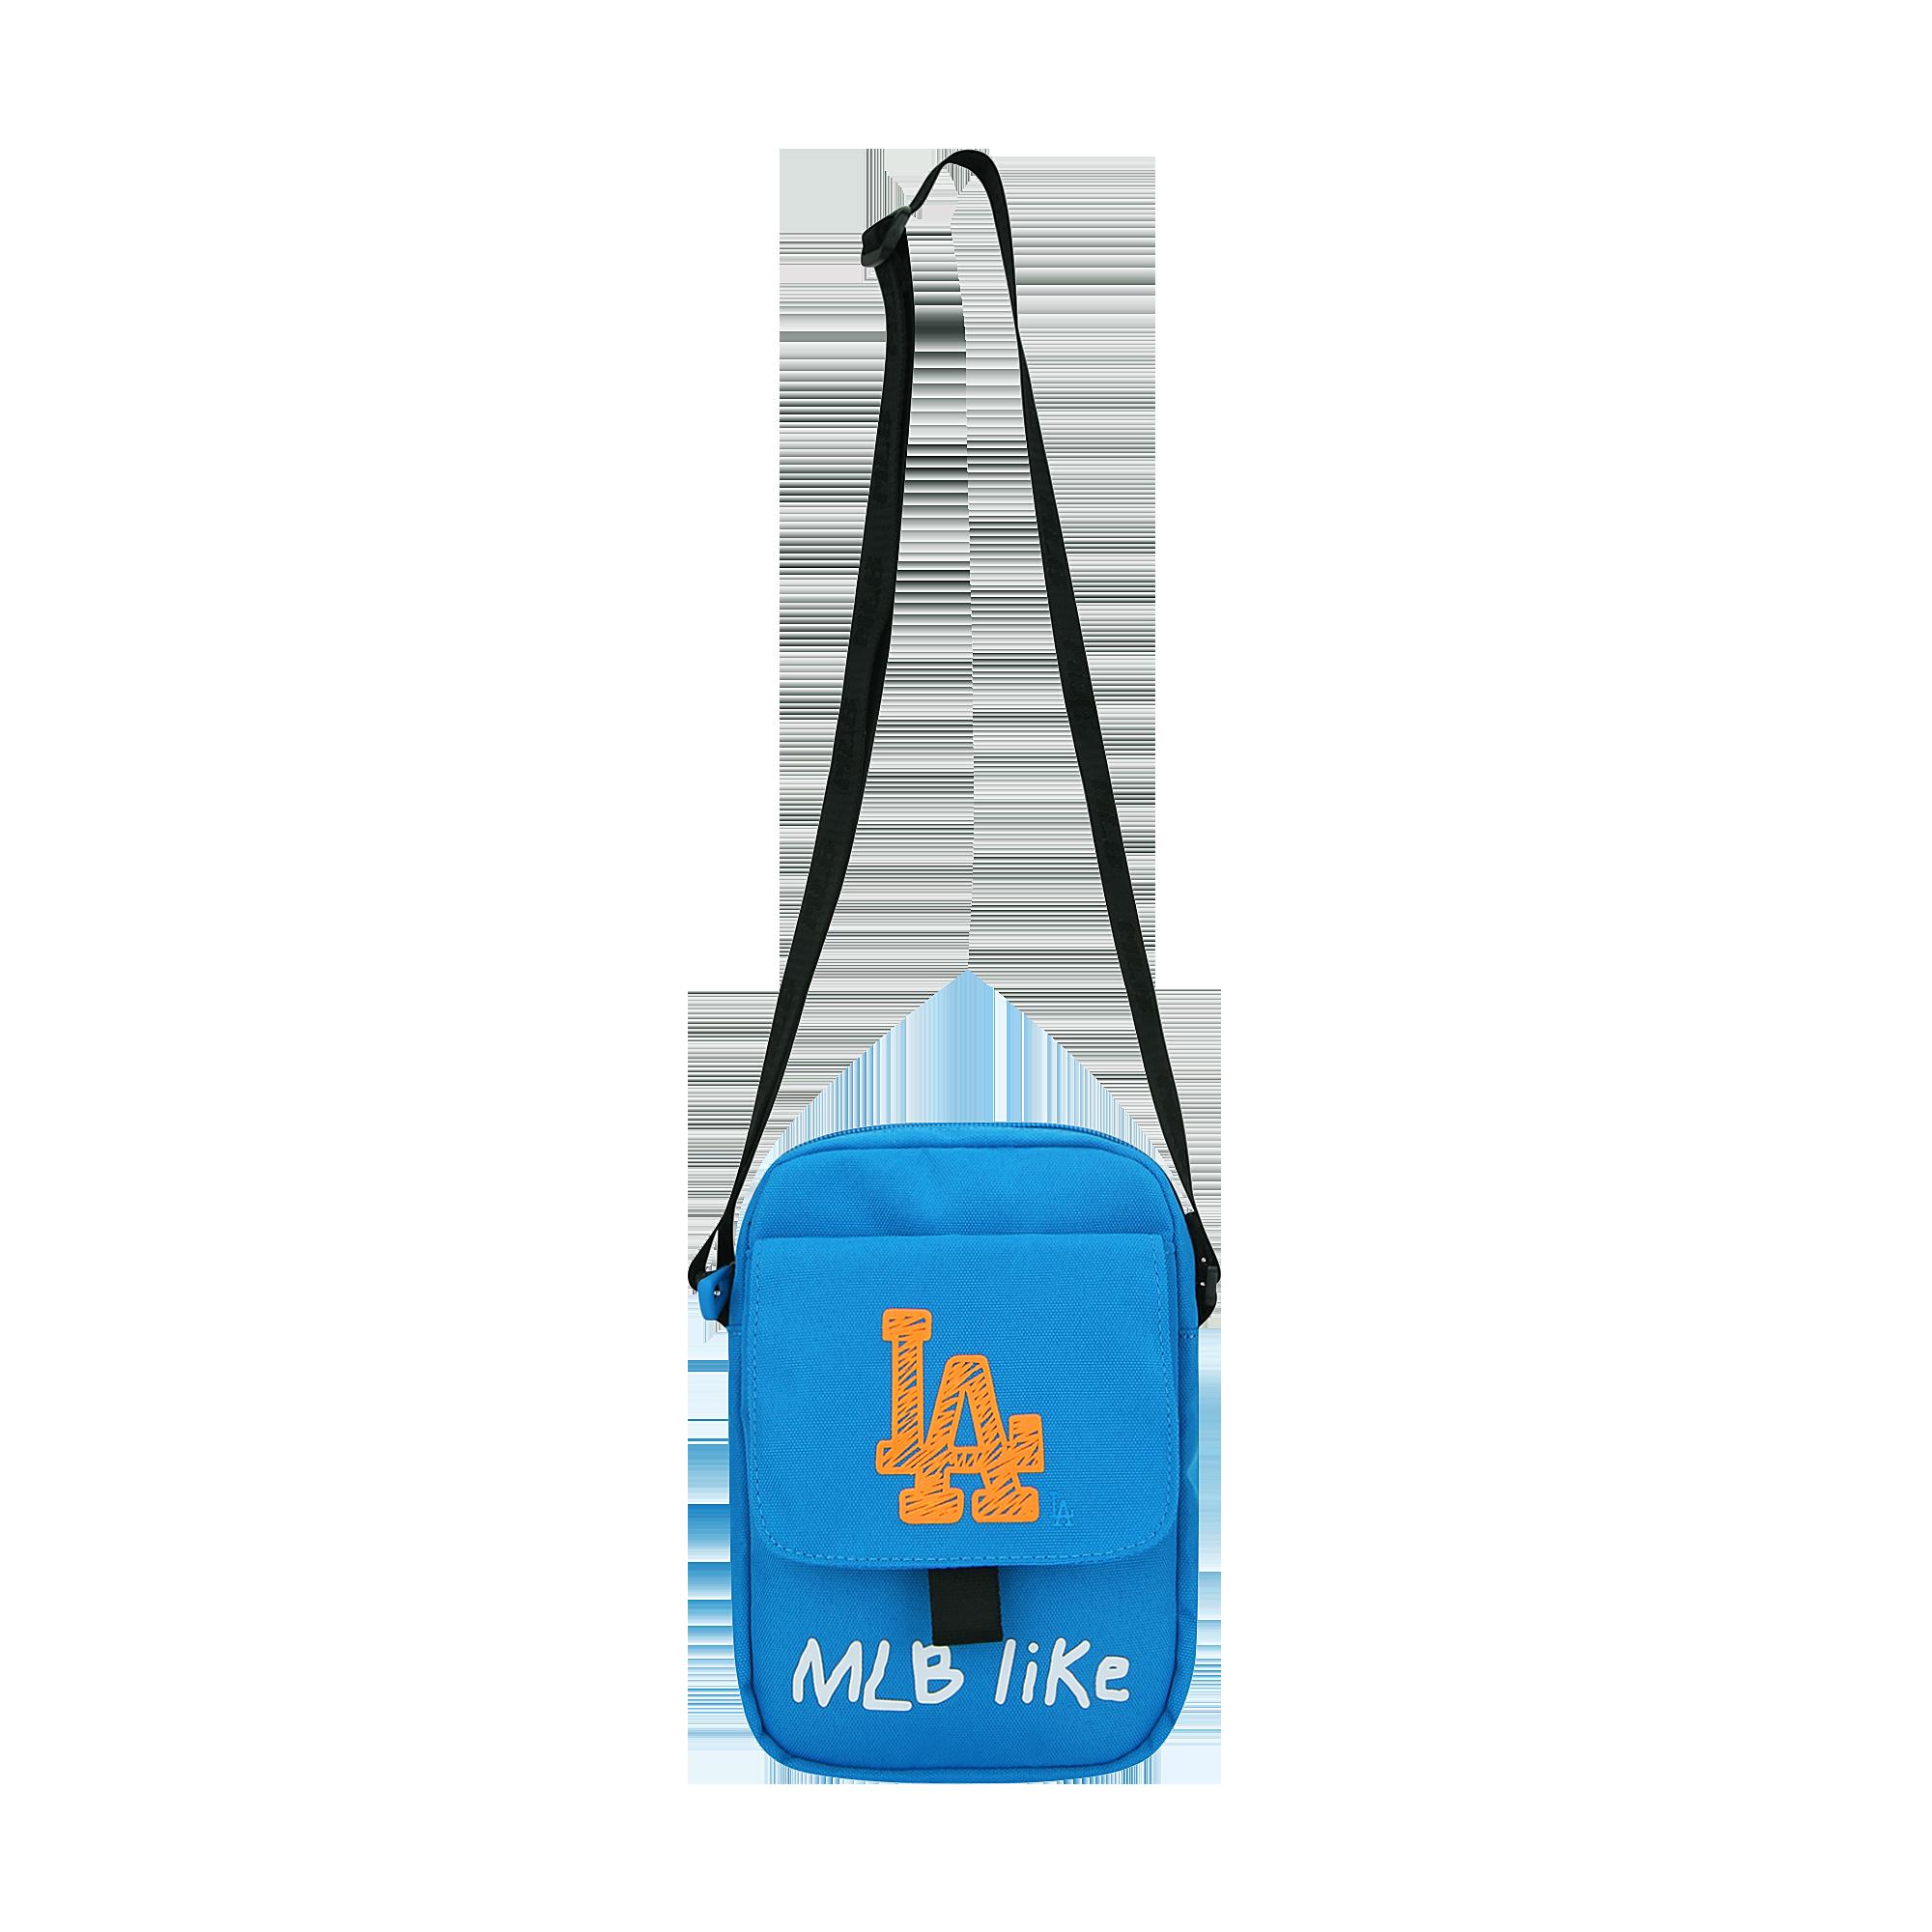 MLB LIKE: 라이크 미니크로스백 LA다저스